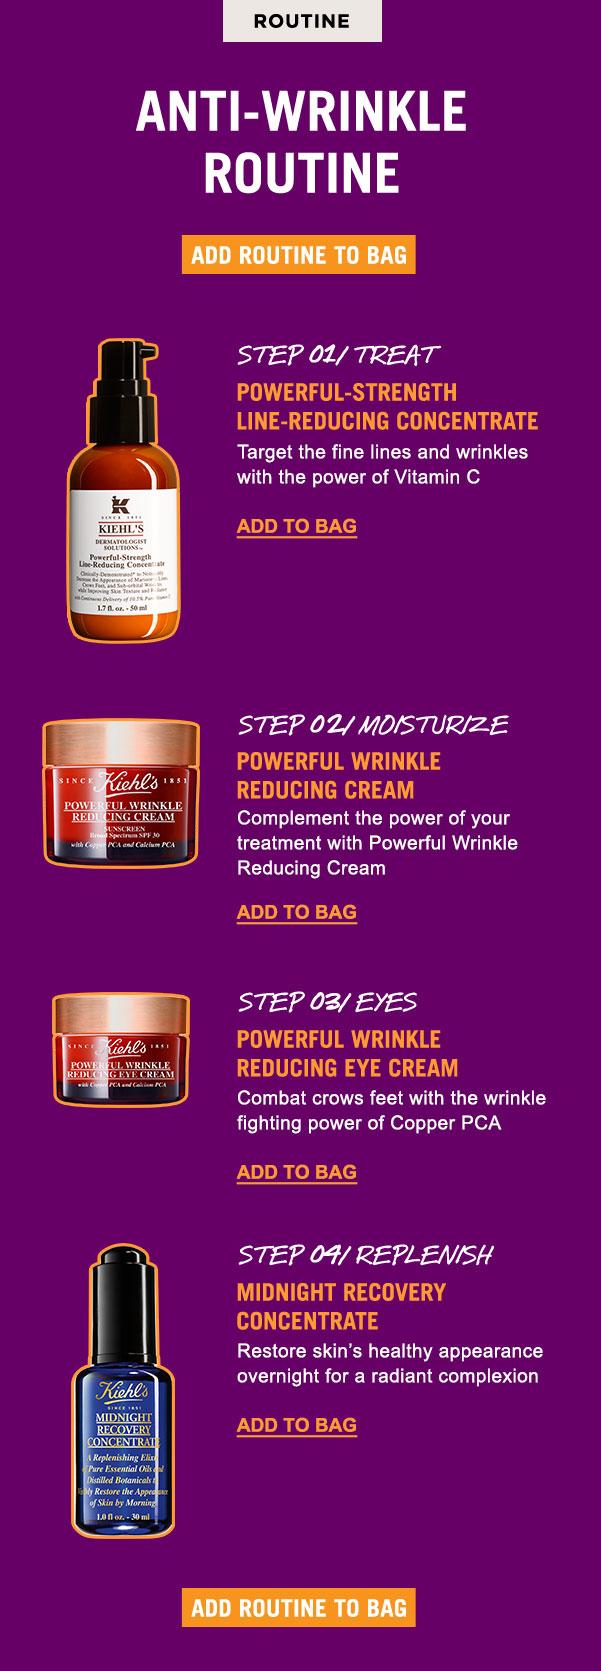 Anti-wrinkle routine